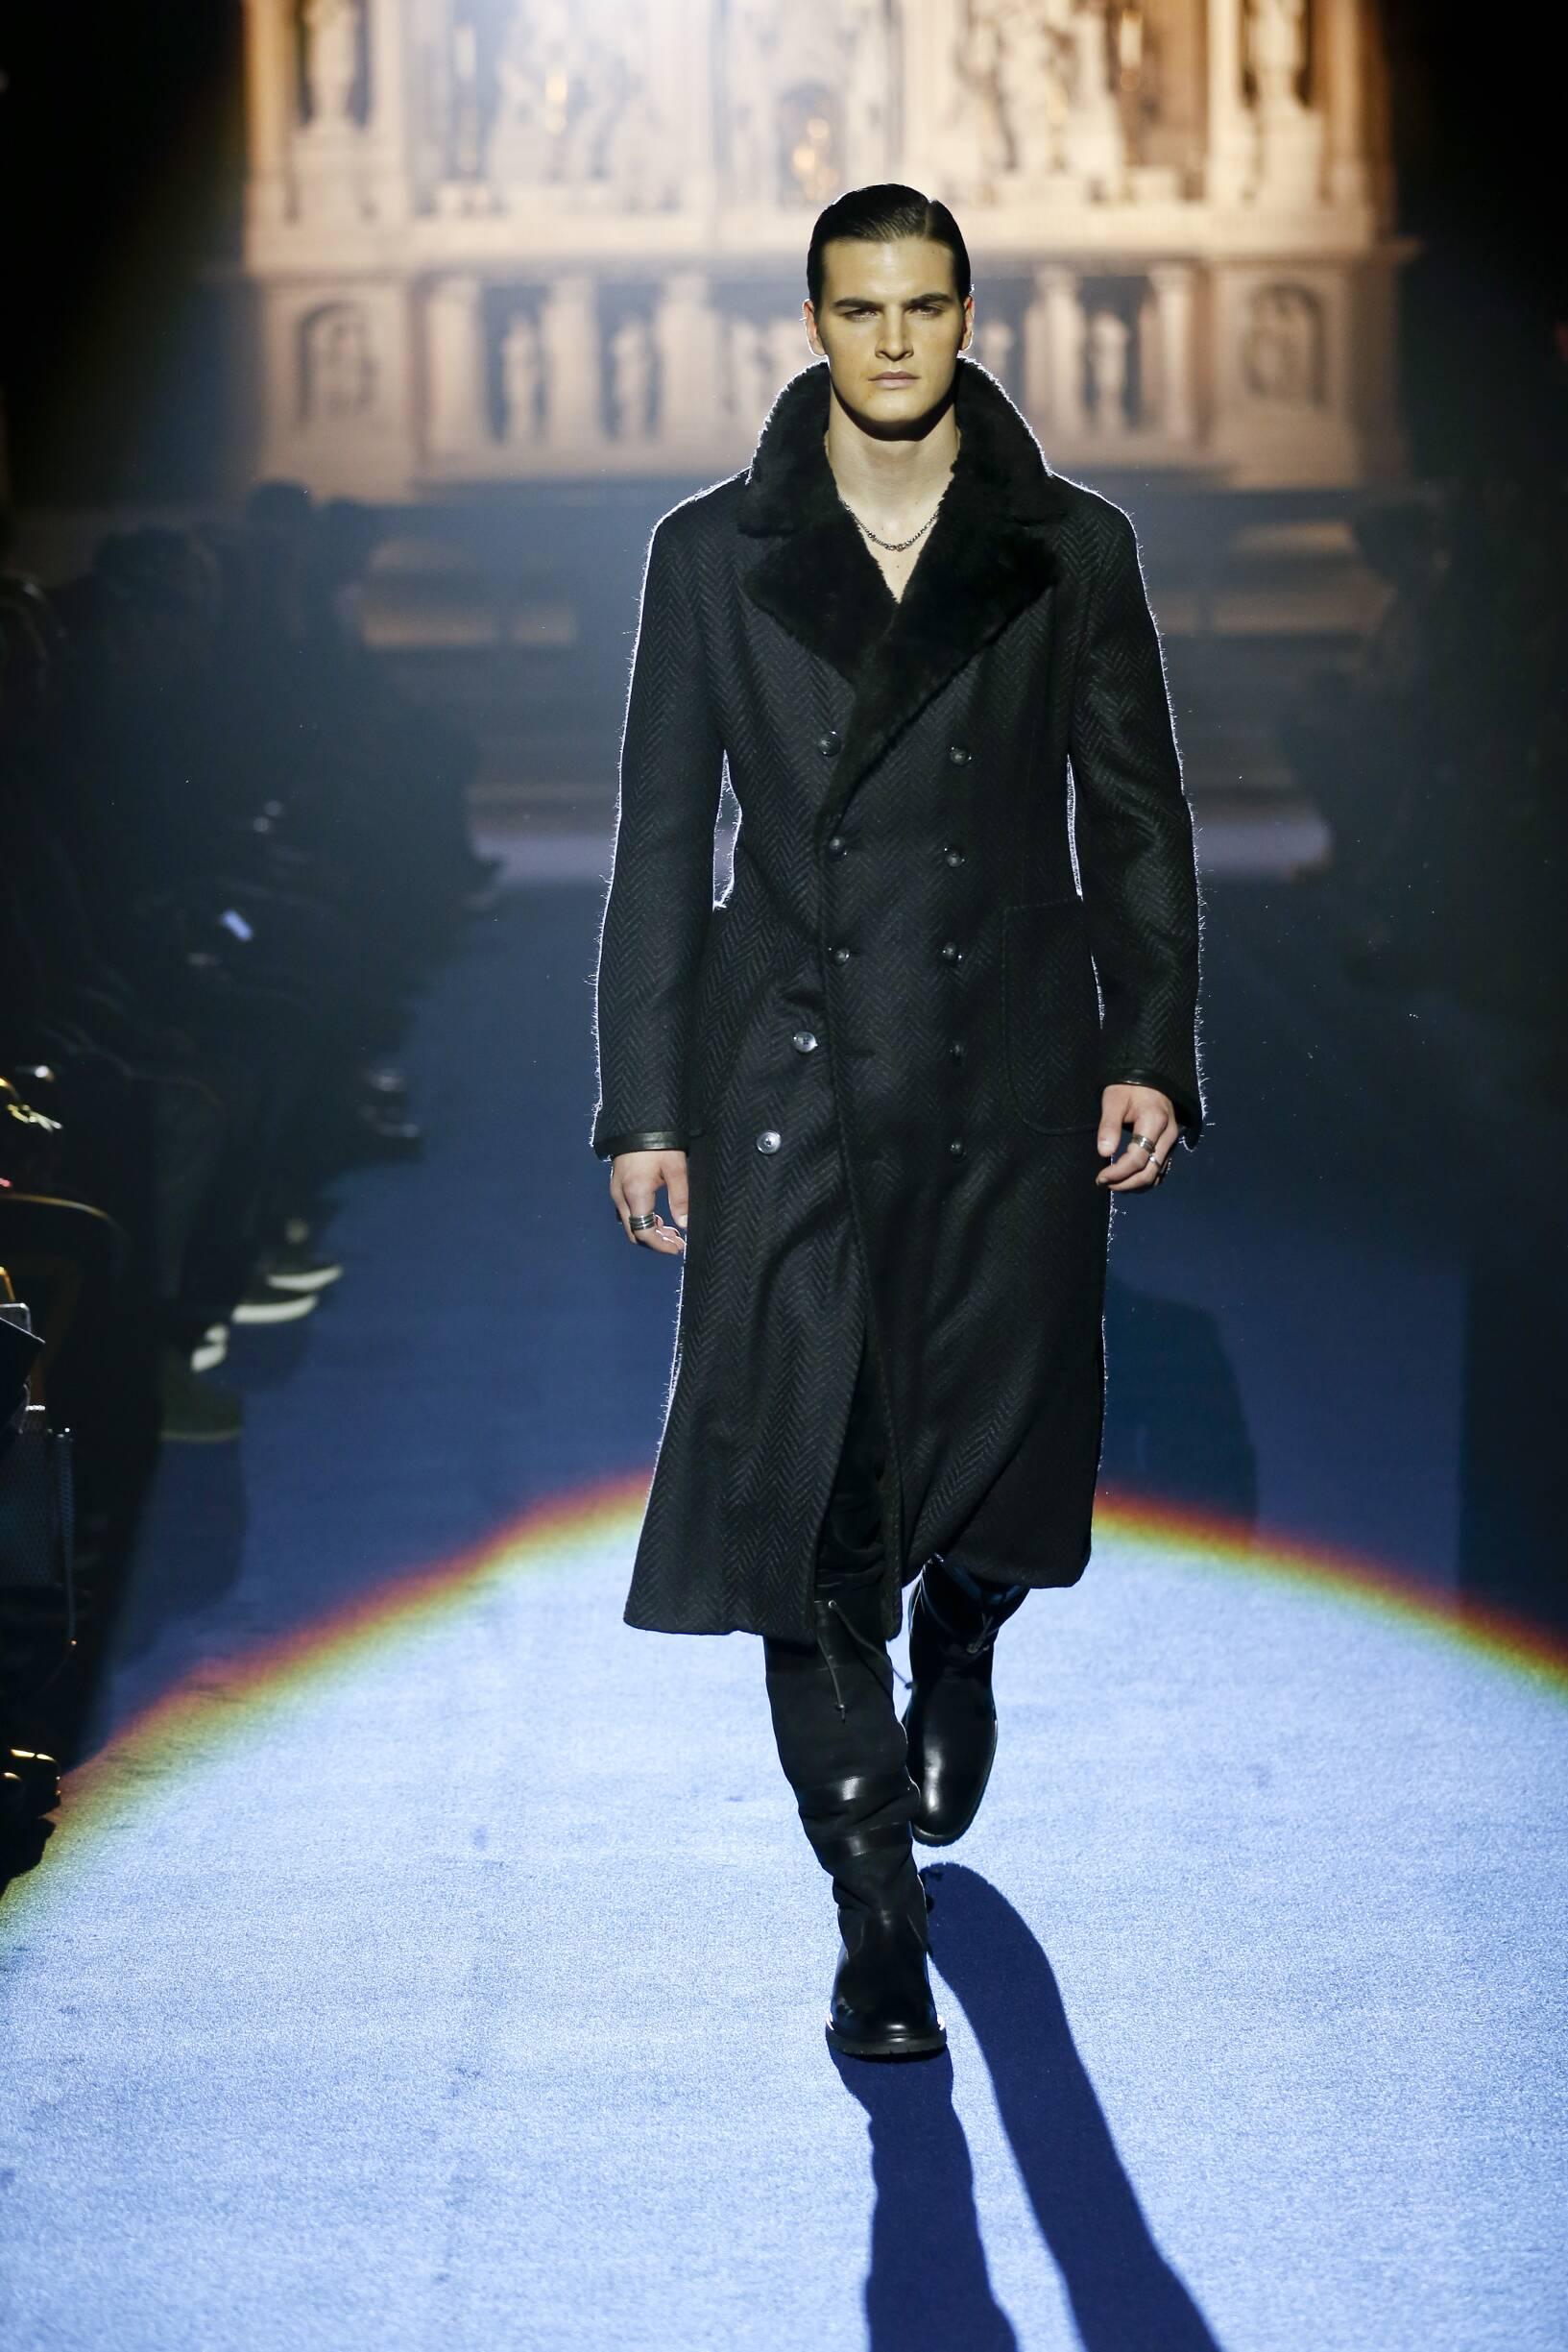 Man Model Fashion Show Joseph Abboud